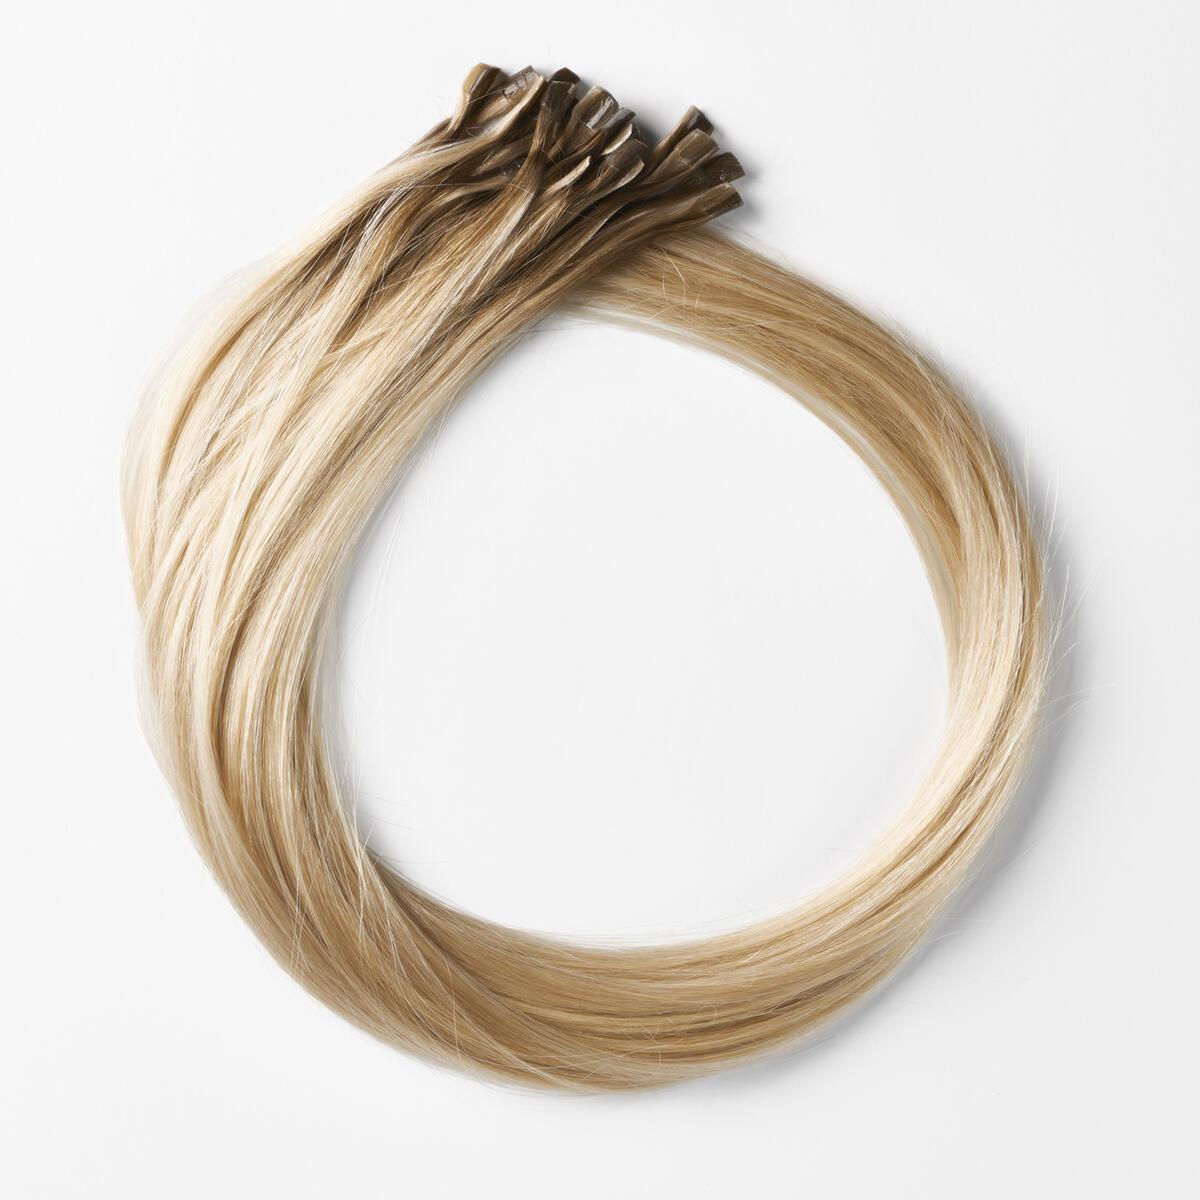 Nail Hair C7.3/8.3 Brilliant Blonde ColorMelt 50 cm